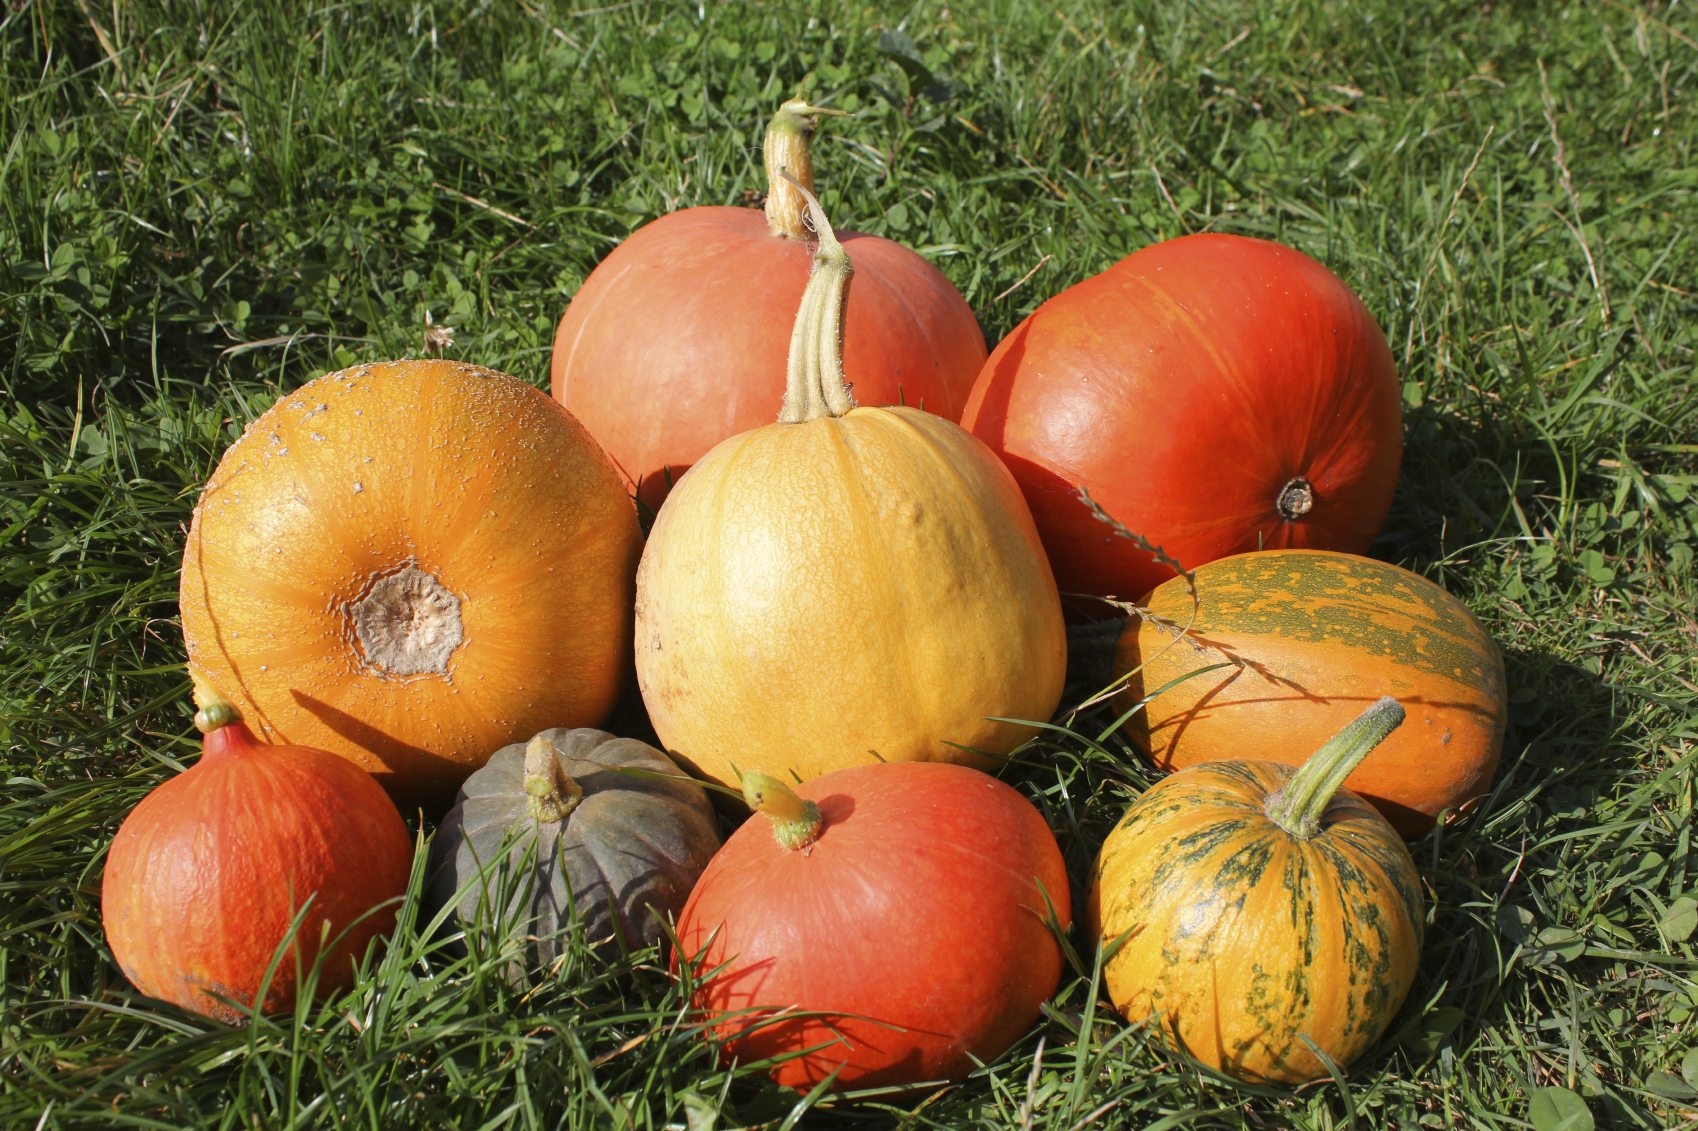 Growing Different Kinds Of Pumpkins Popular Mini And Giant Pumpkin Varieties For The Garden